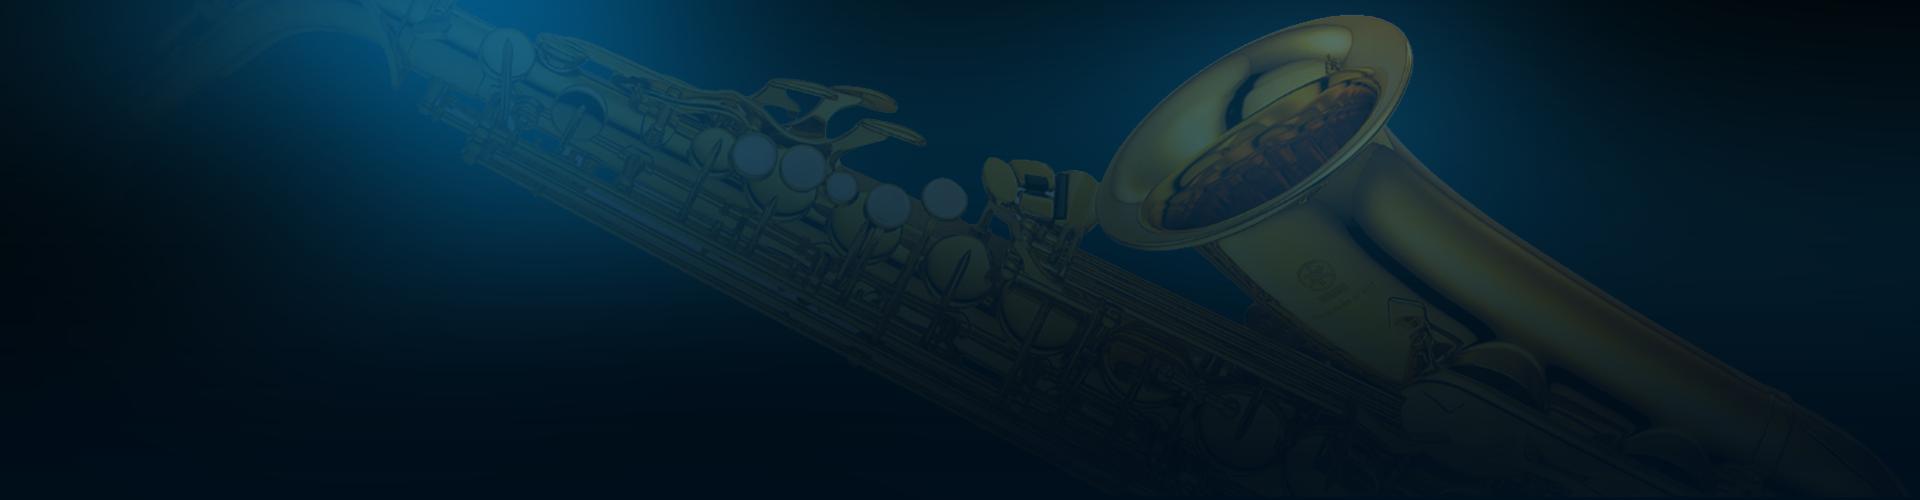 musicians-blue-bg